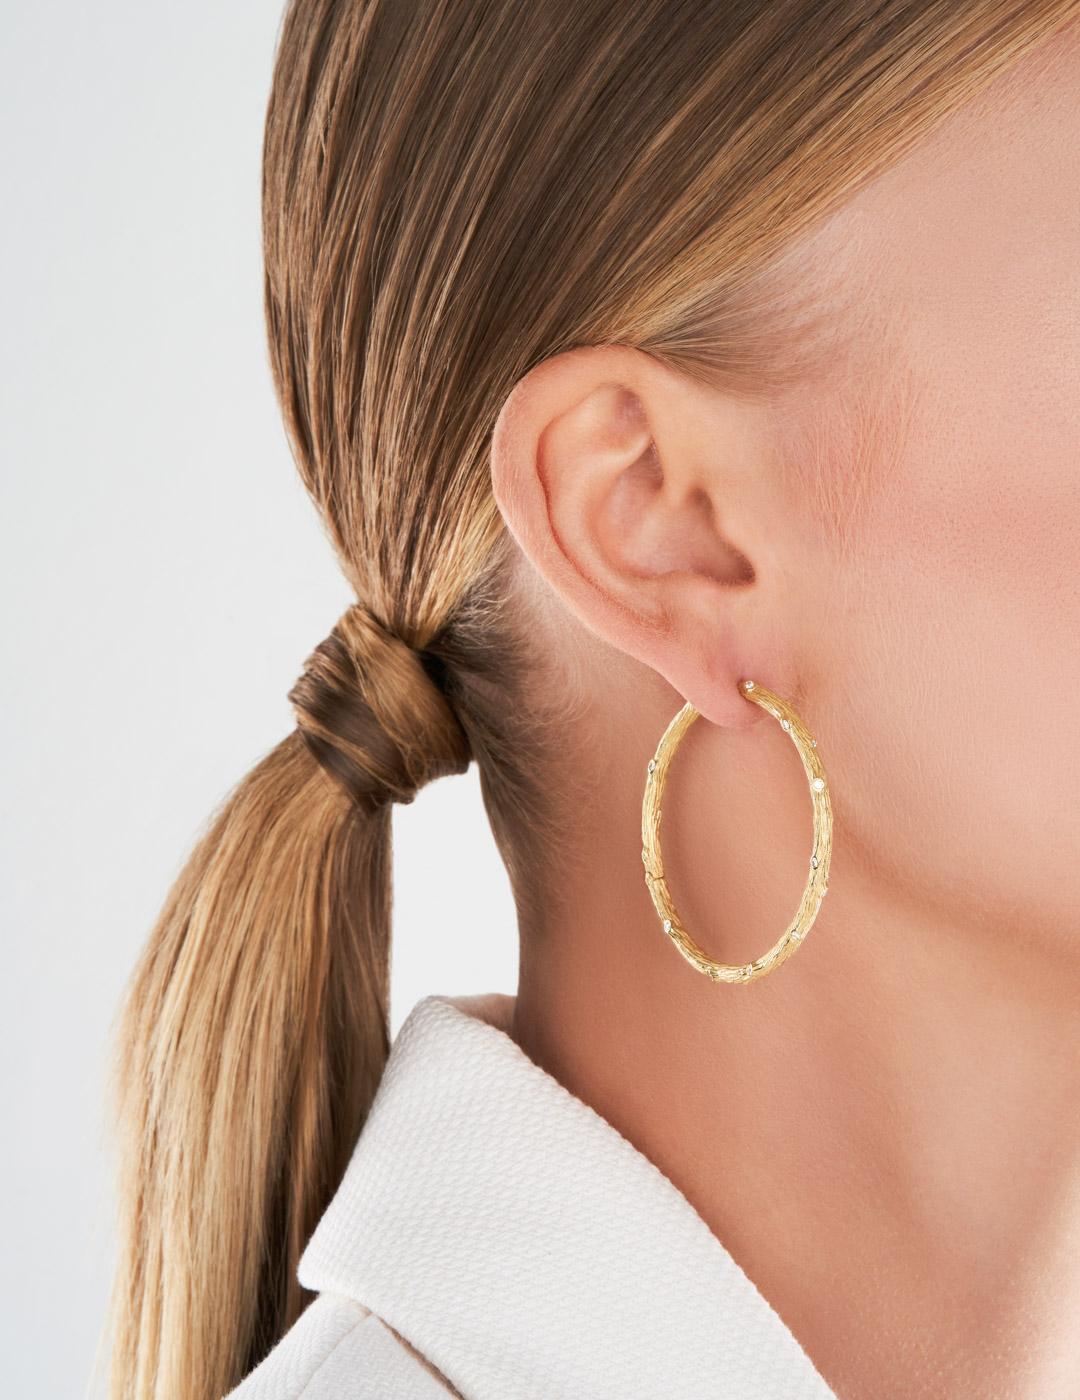 mish_products_earrings_Twig-XL Hoop YG-ER-2